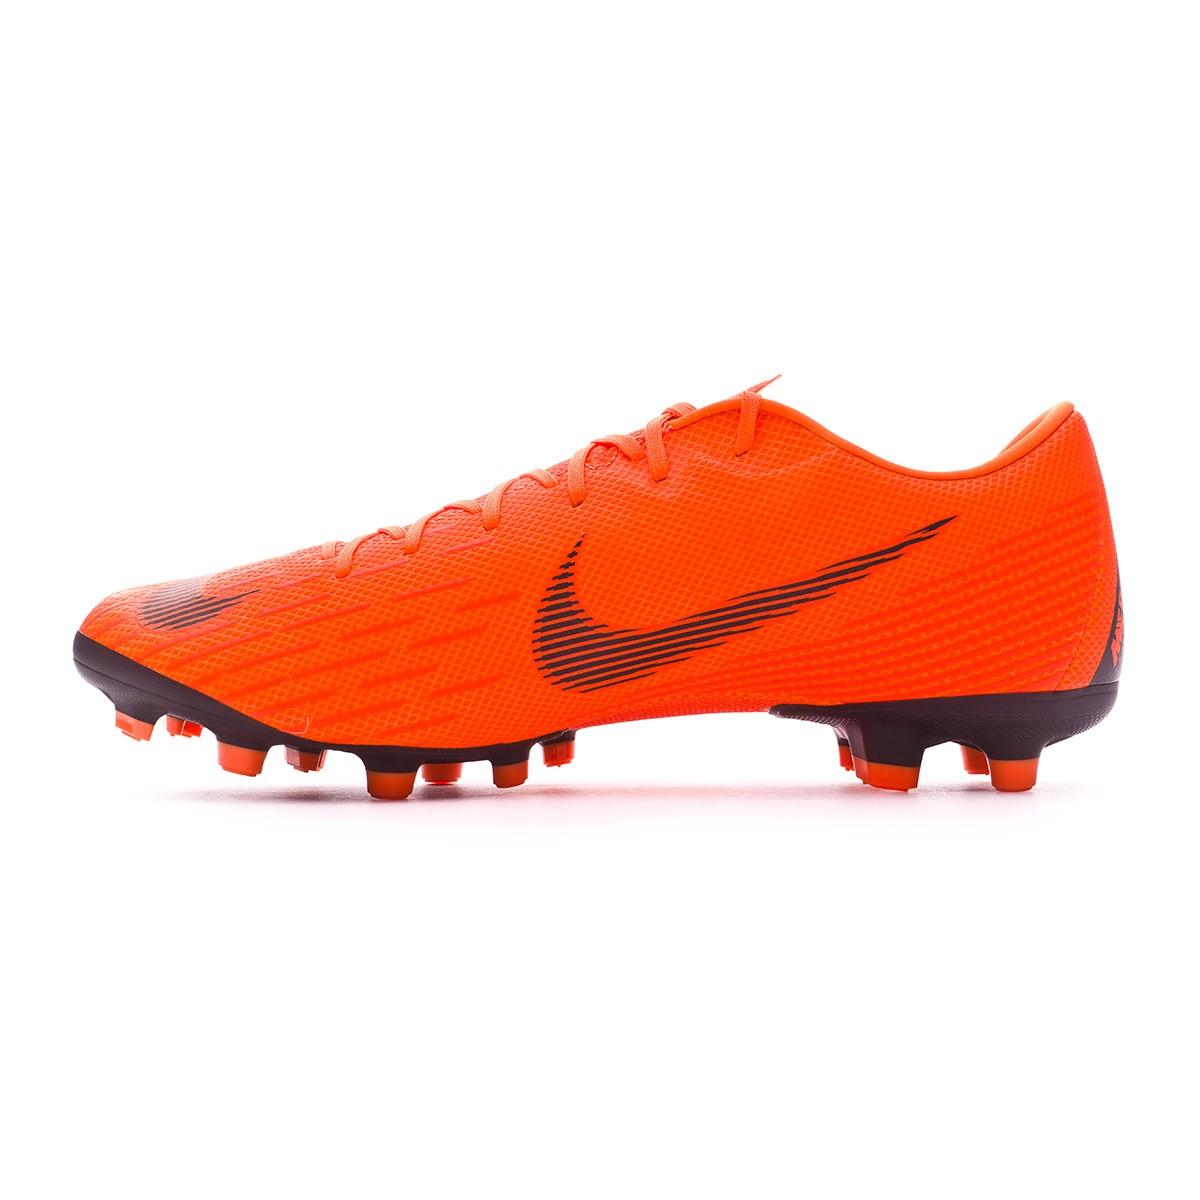 70671b5a6a5 Boot Nike Mercurial Vapor XII Academy MG Total orange-Black-Volt - Leaked  soccer